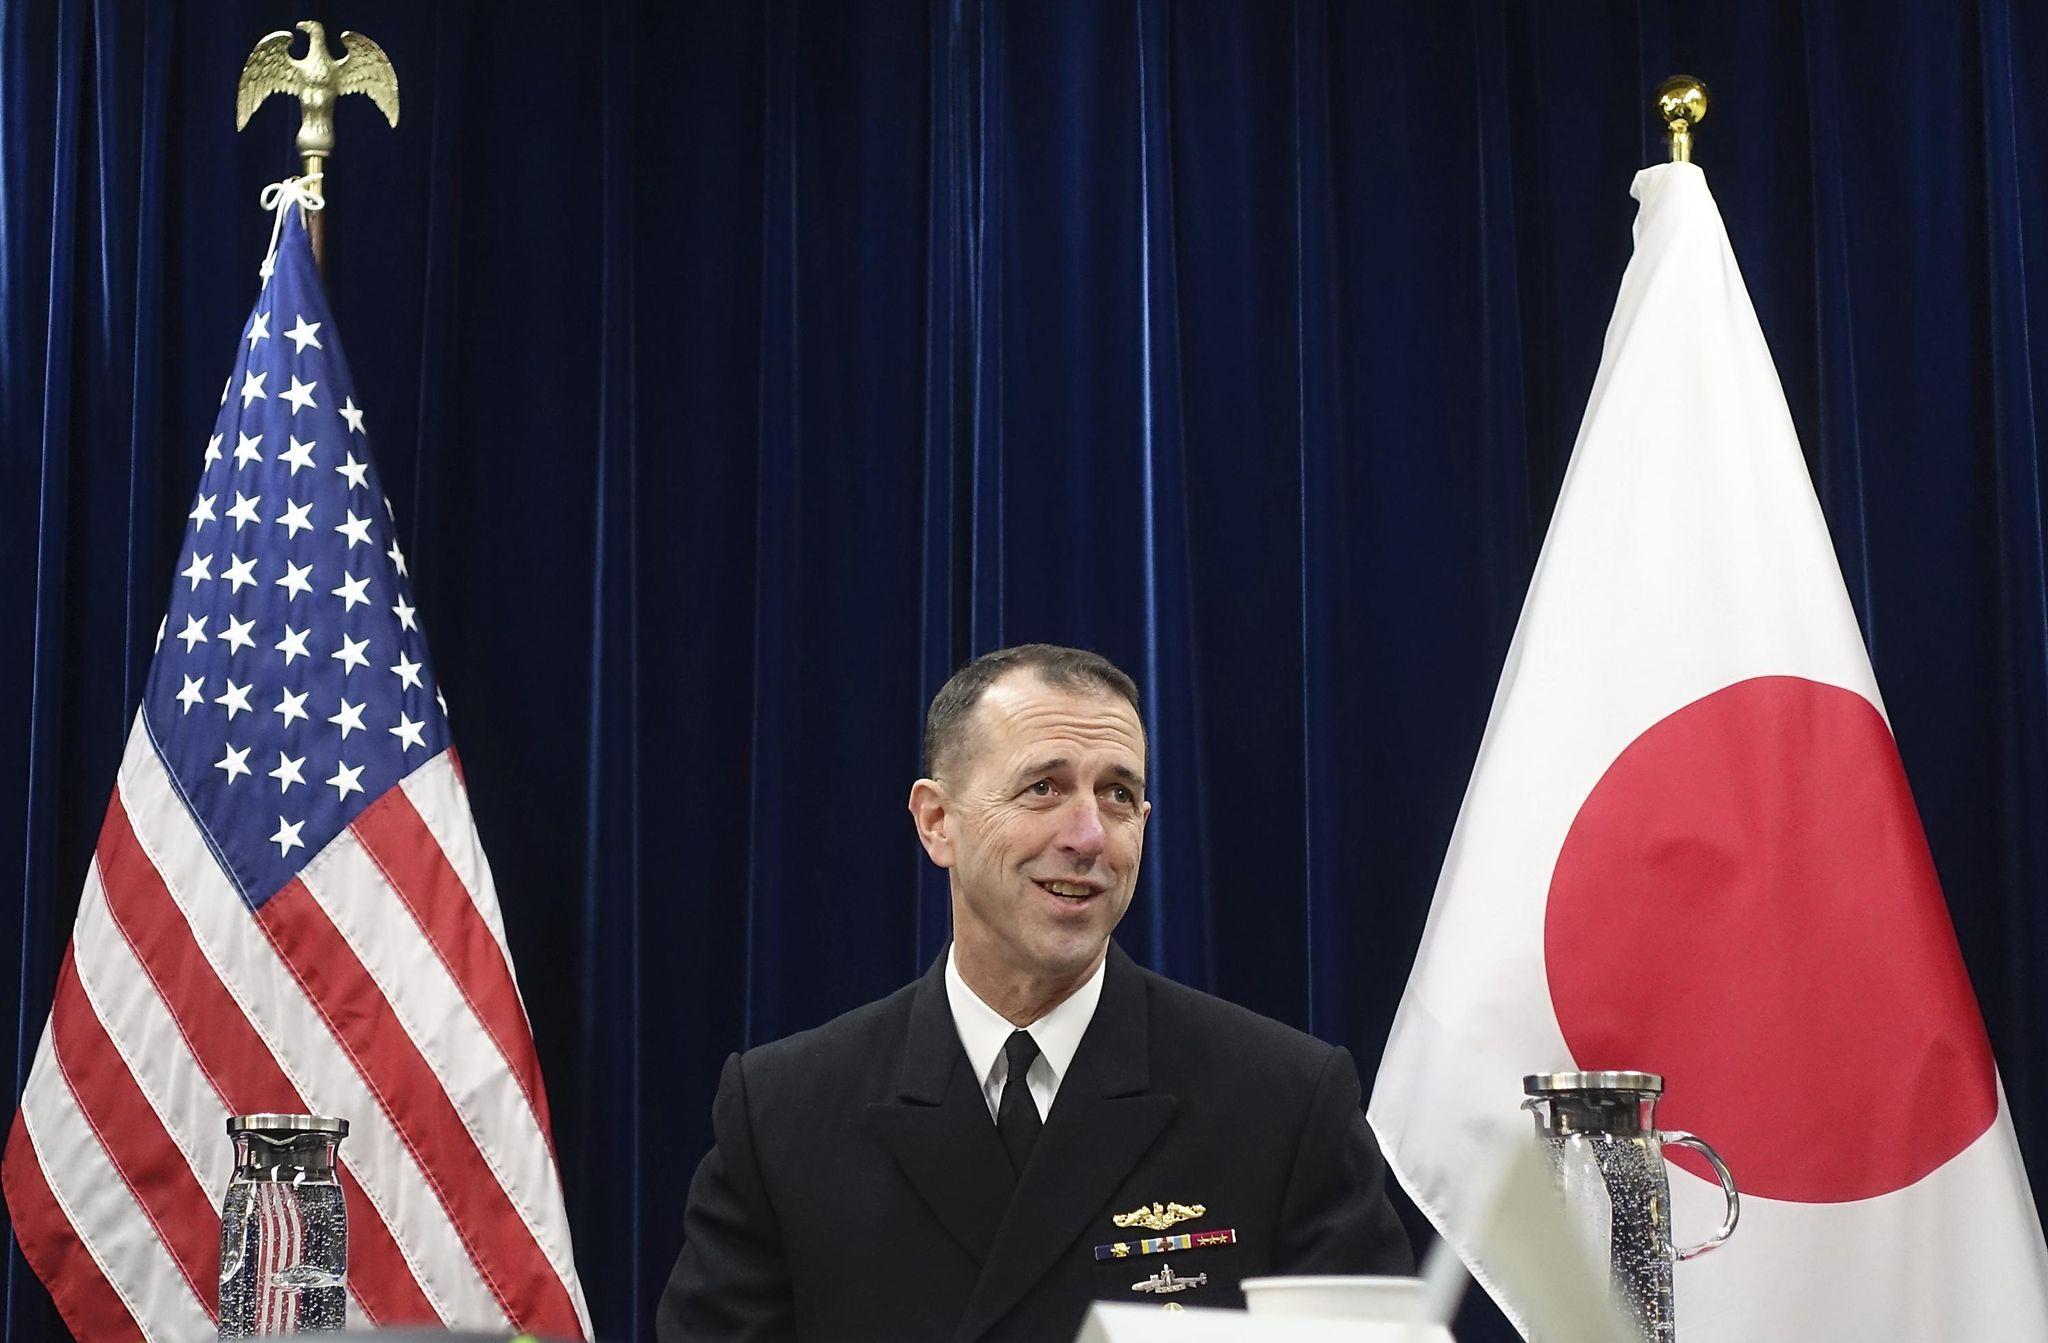 U.S. considers sending aircraft carrier through Taiwan Strait